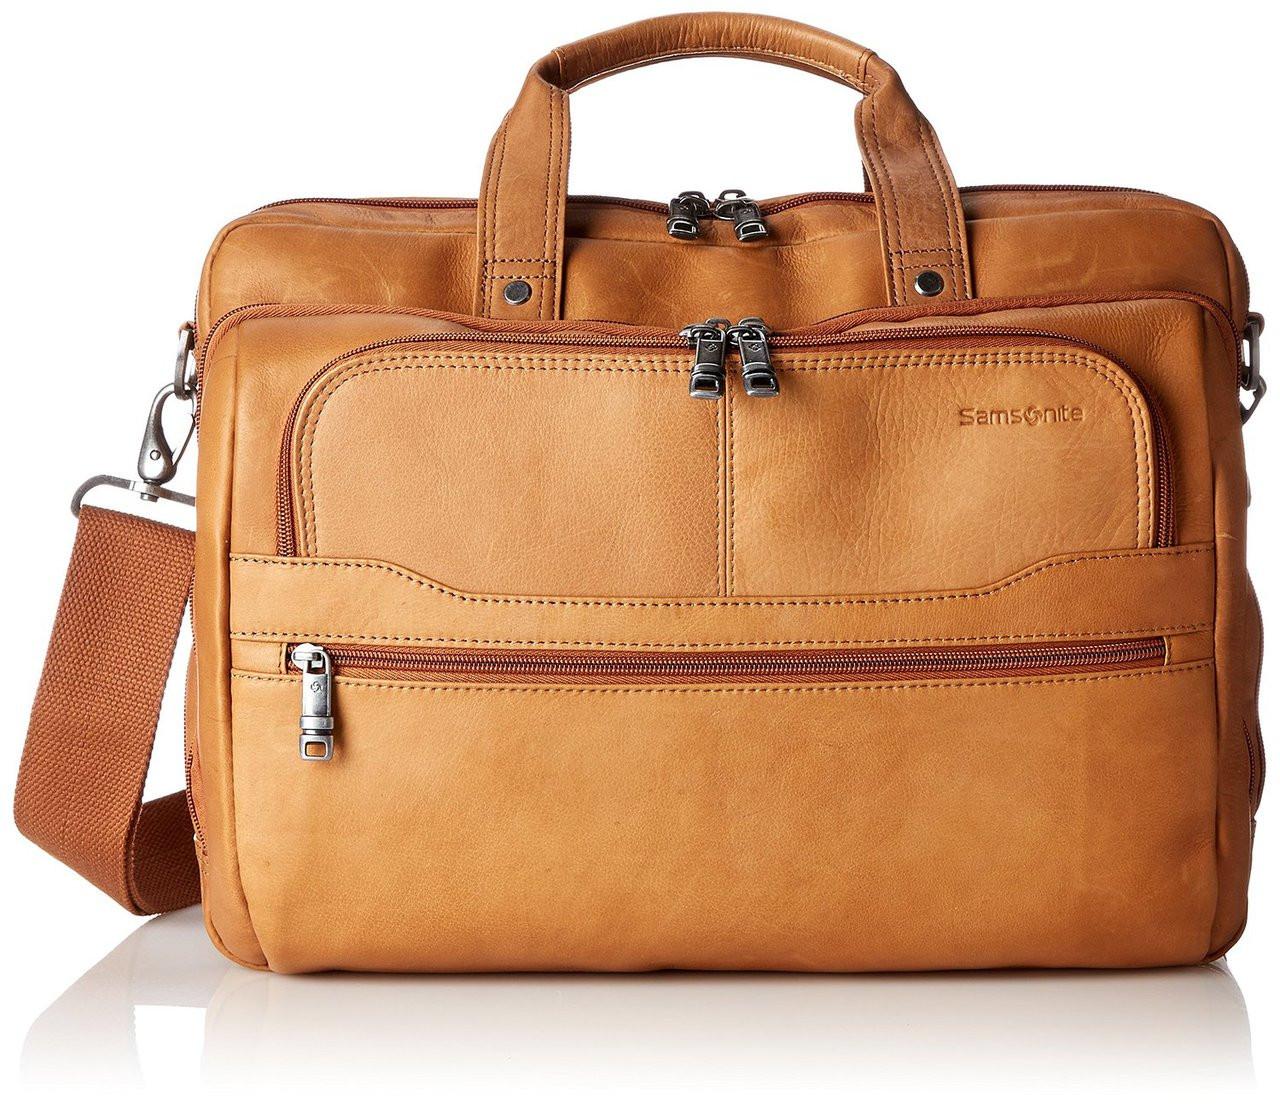 Samsonite Colombian Leather 2 Pocket Business Case 50791